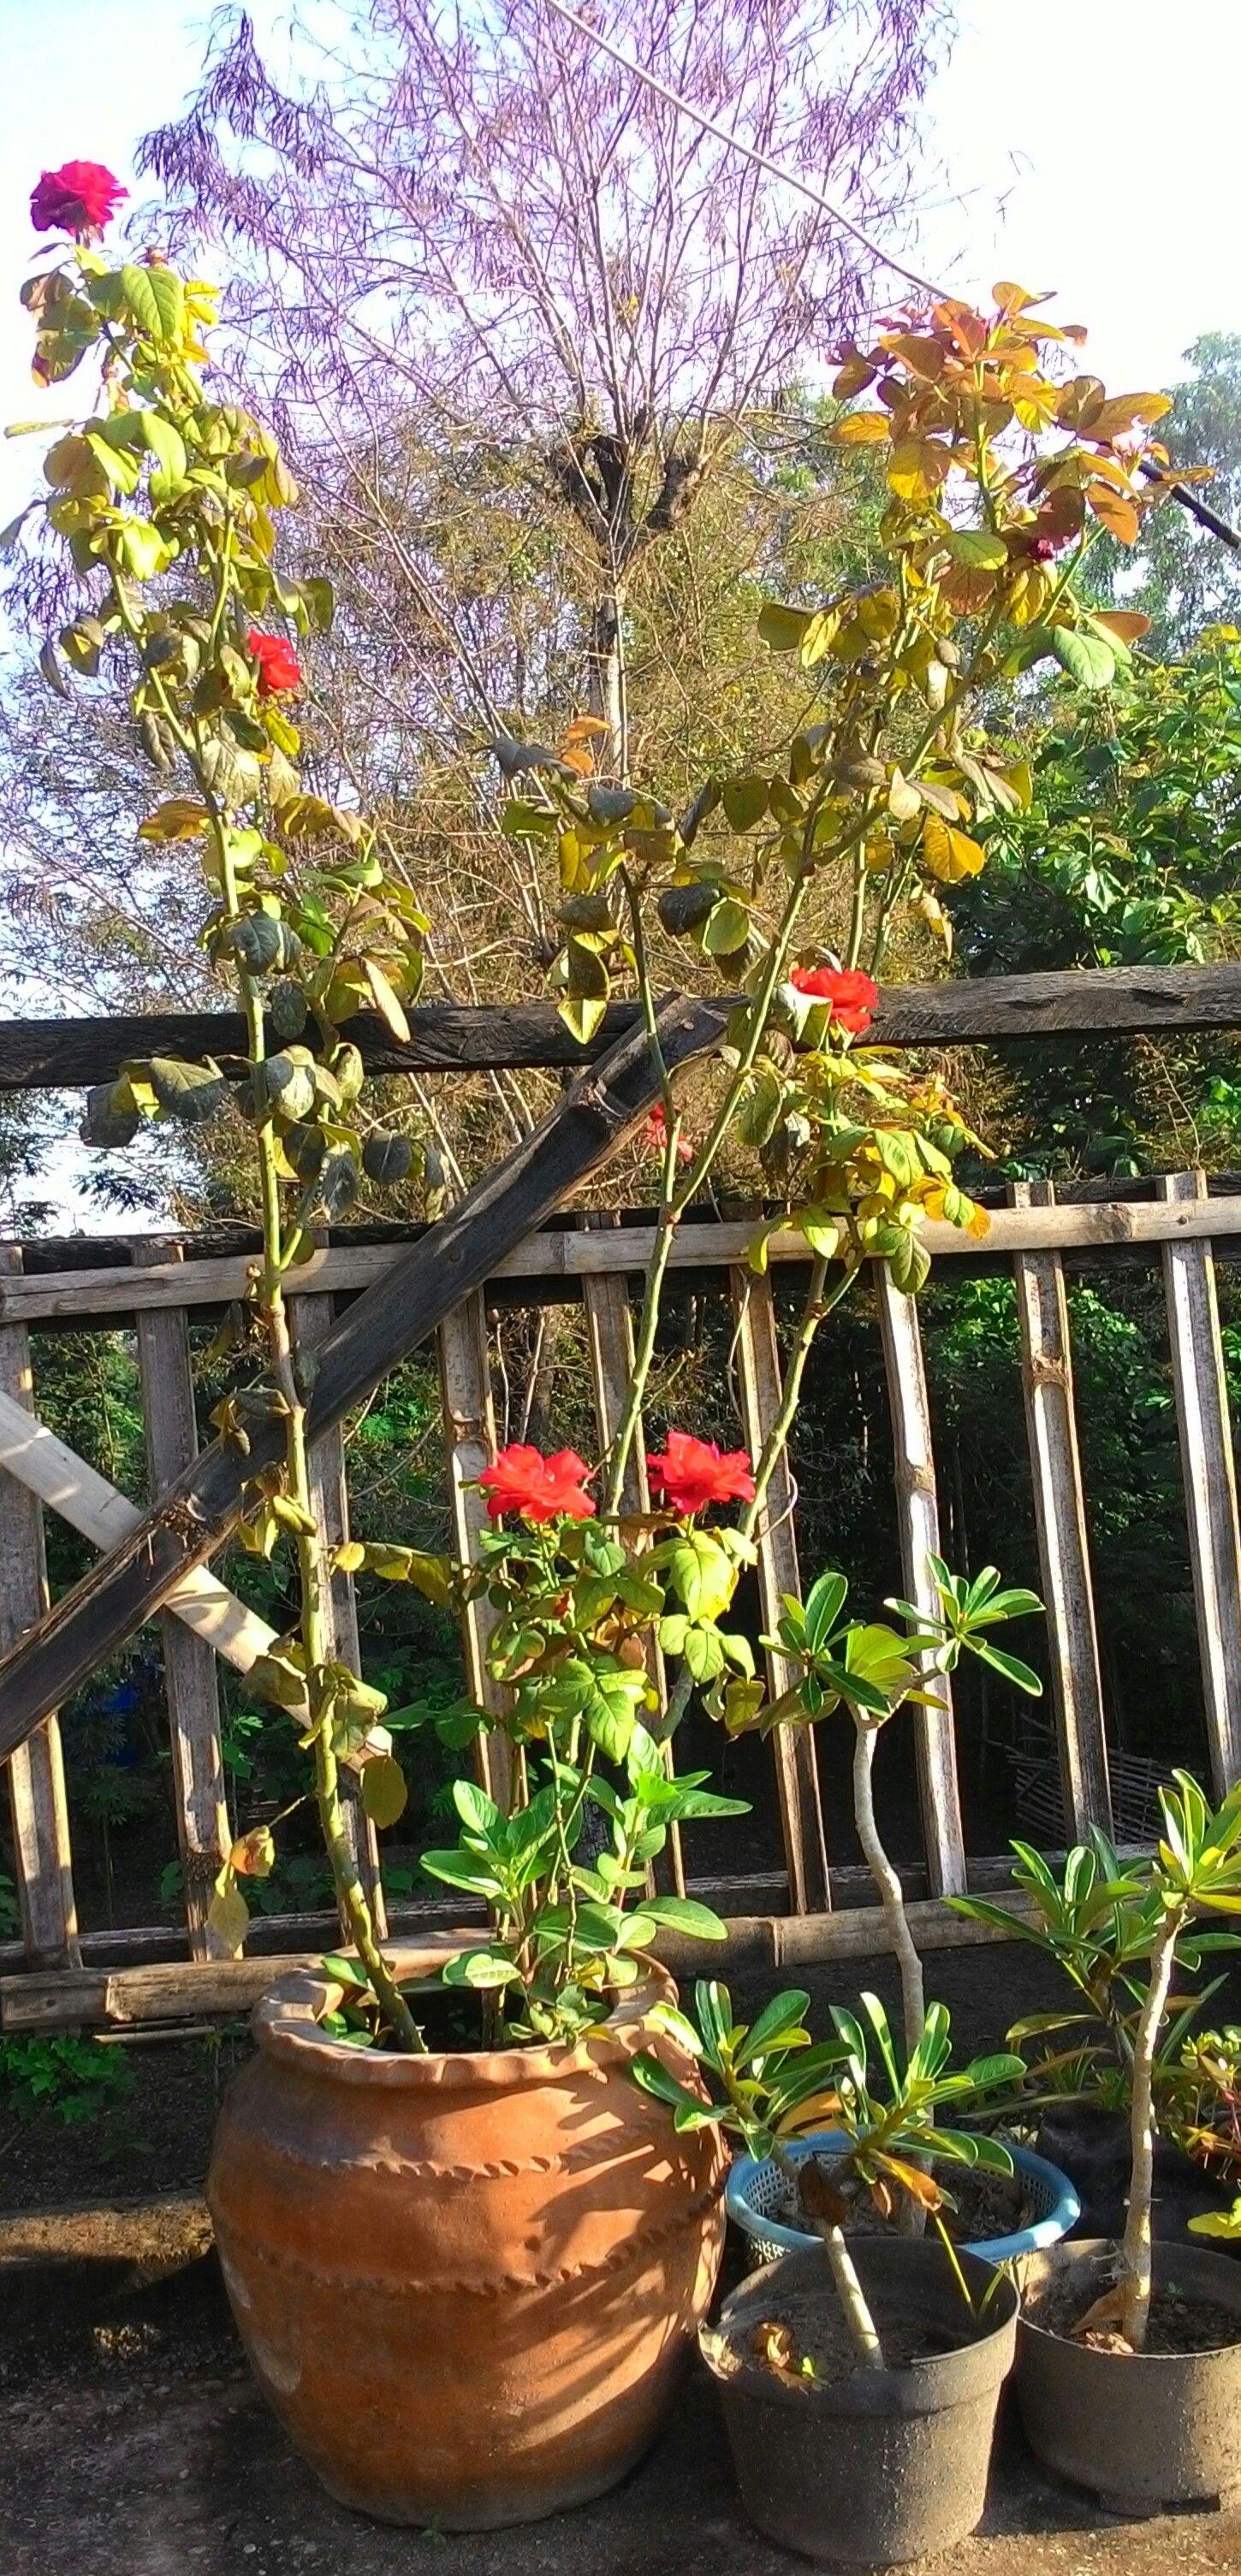 Bunga Mawar Dalam Pot Bunga Mawar Kebun